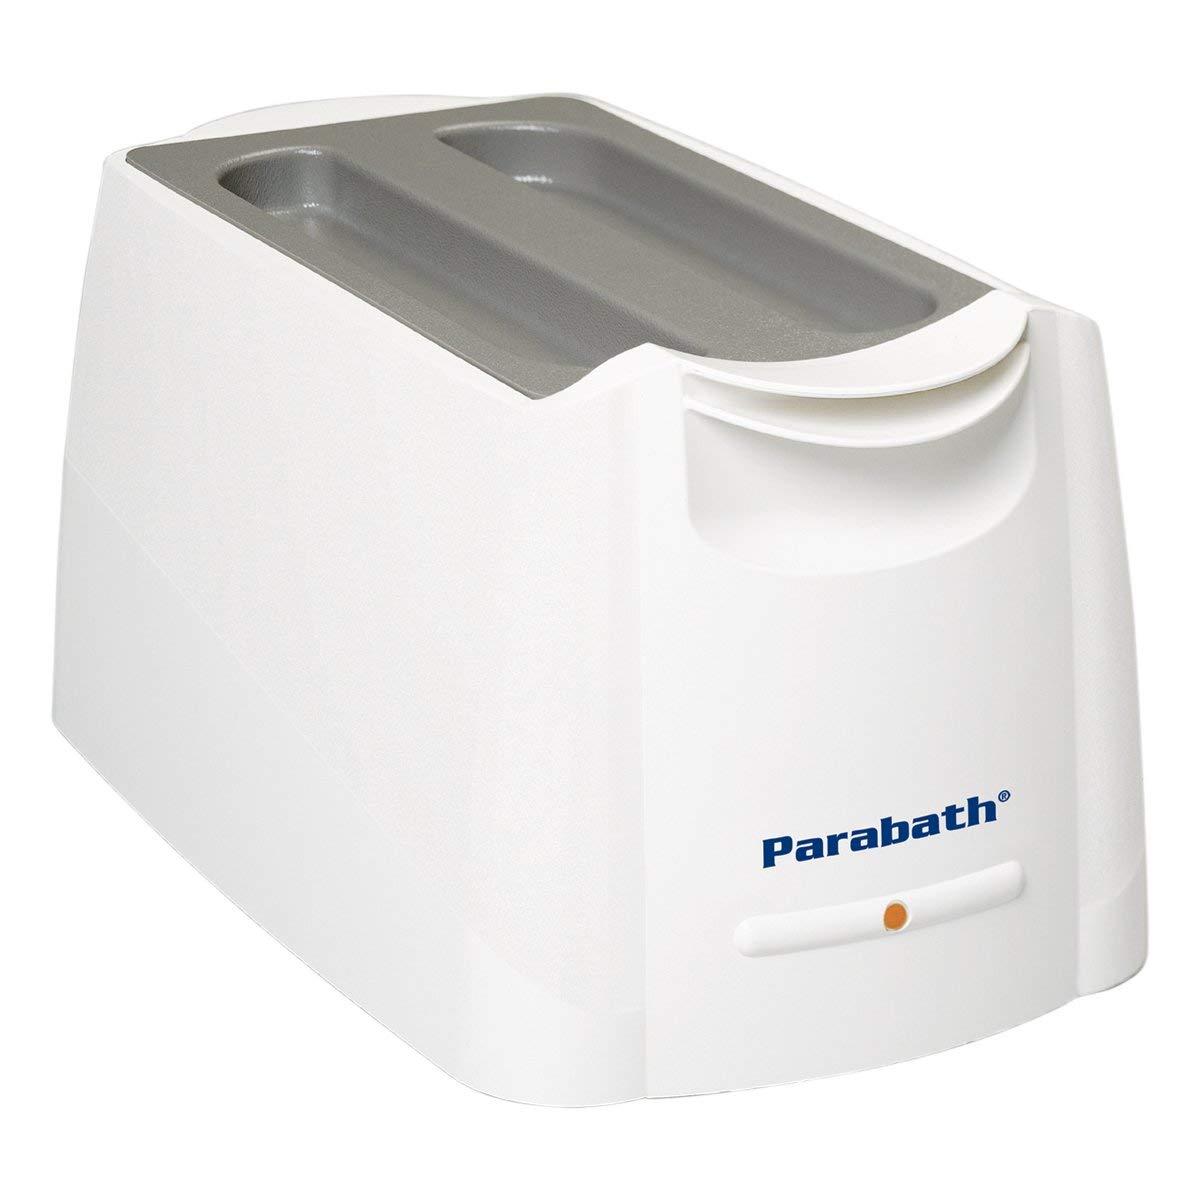 5. Parabath Paraffin Wax Bath: